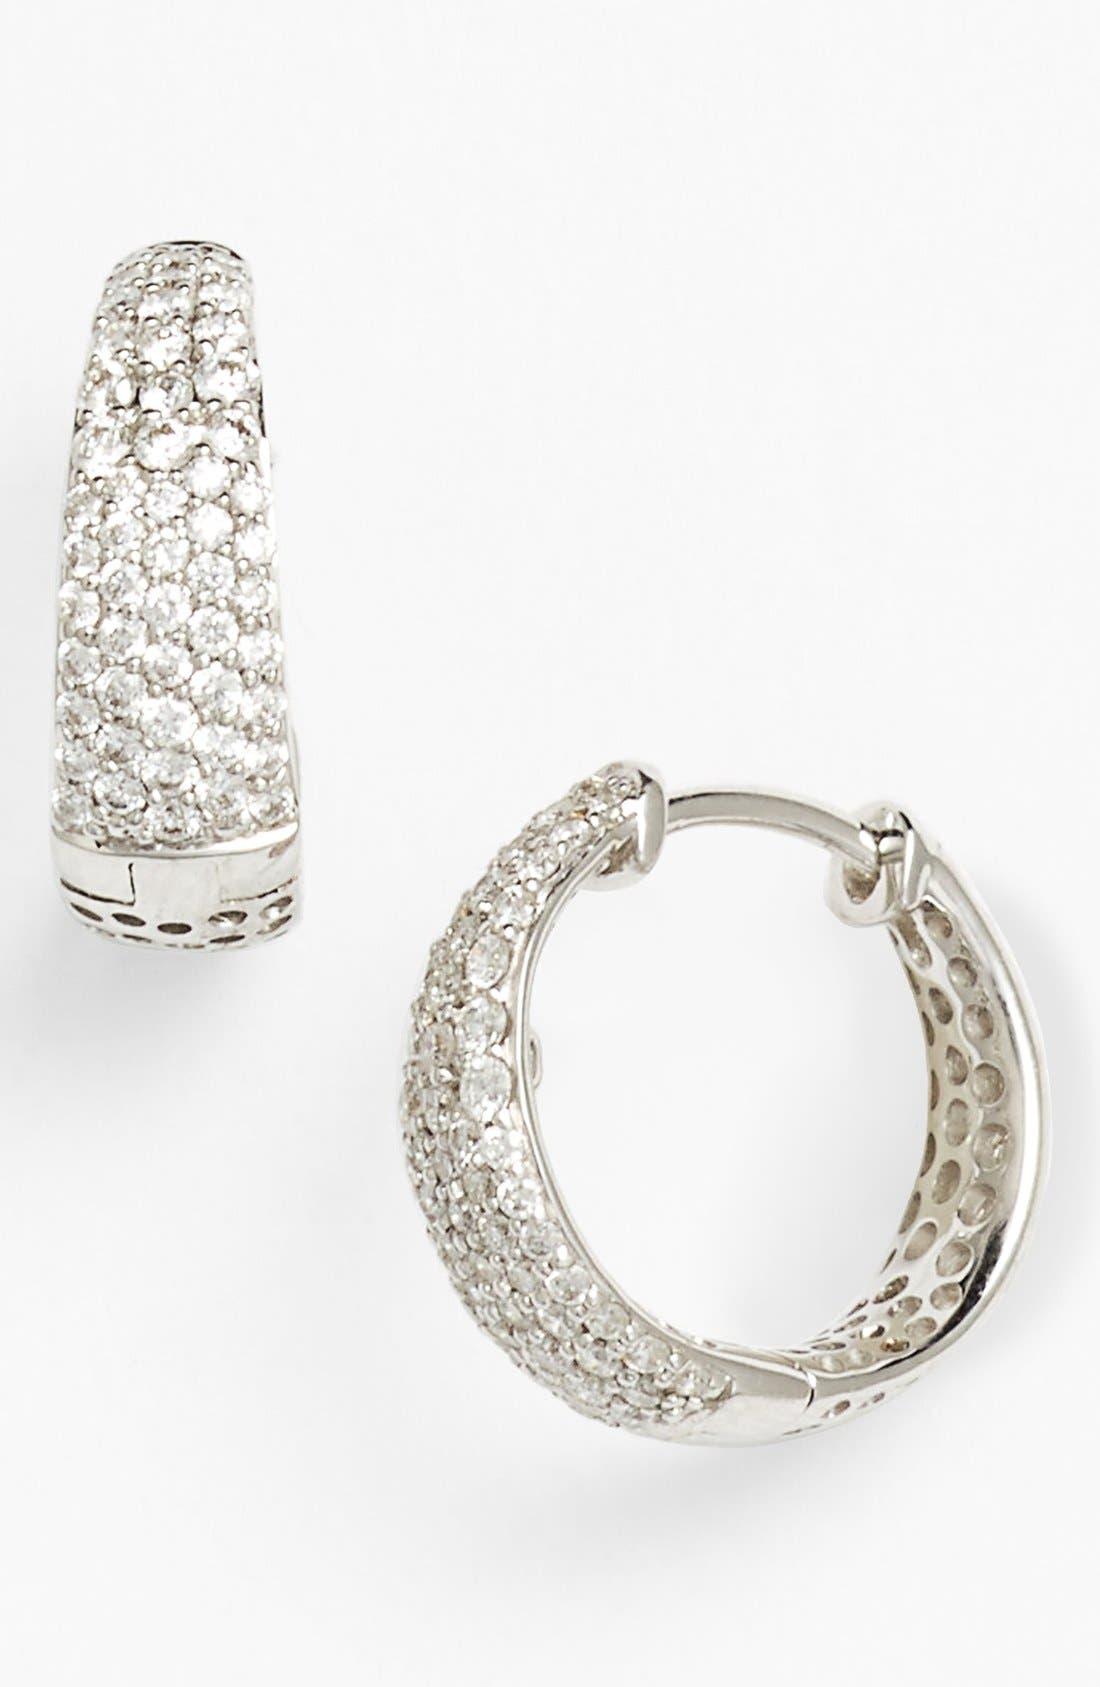 Main Image - Roberto Coin 'Scalare' Diamond Hoop Earrings